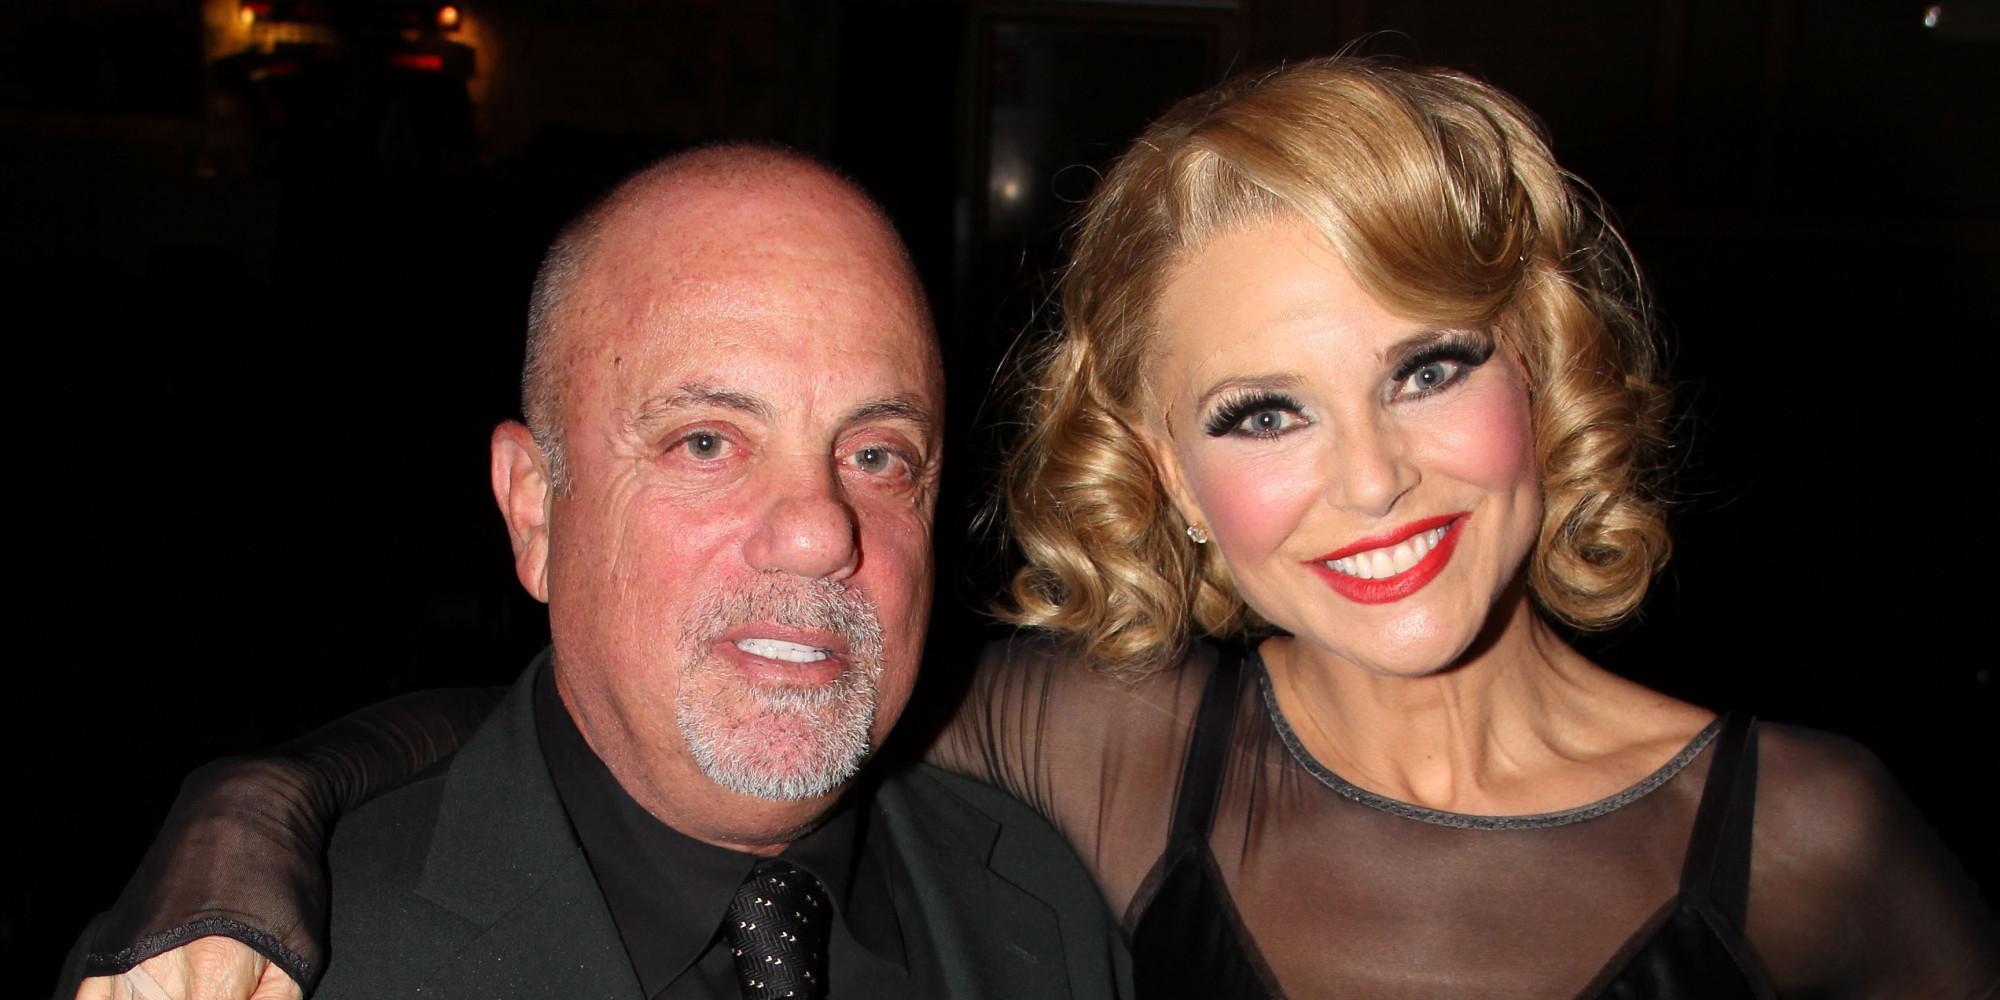 billy joel and christie brinkley dating